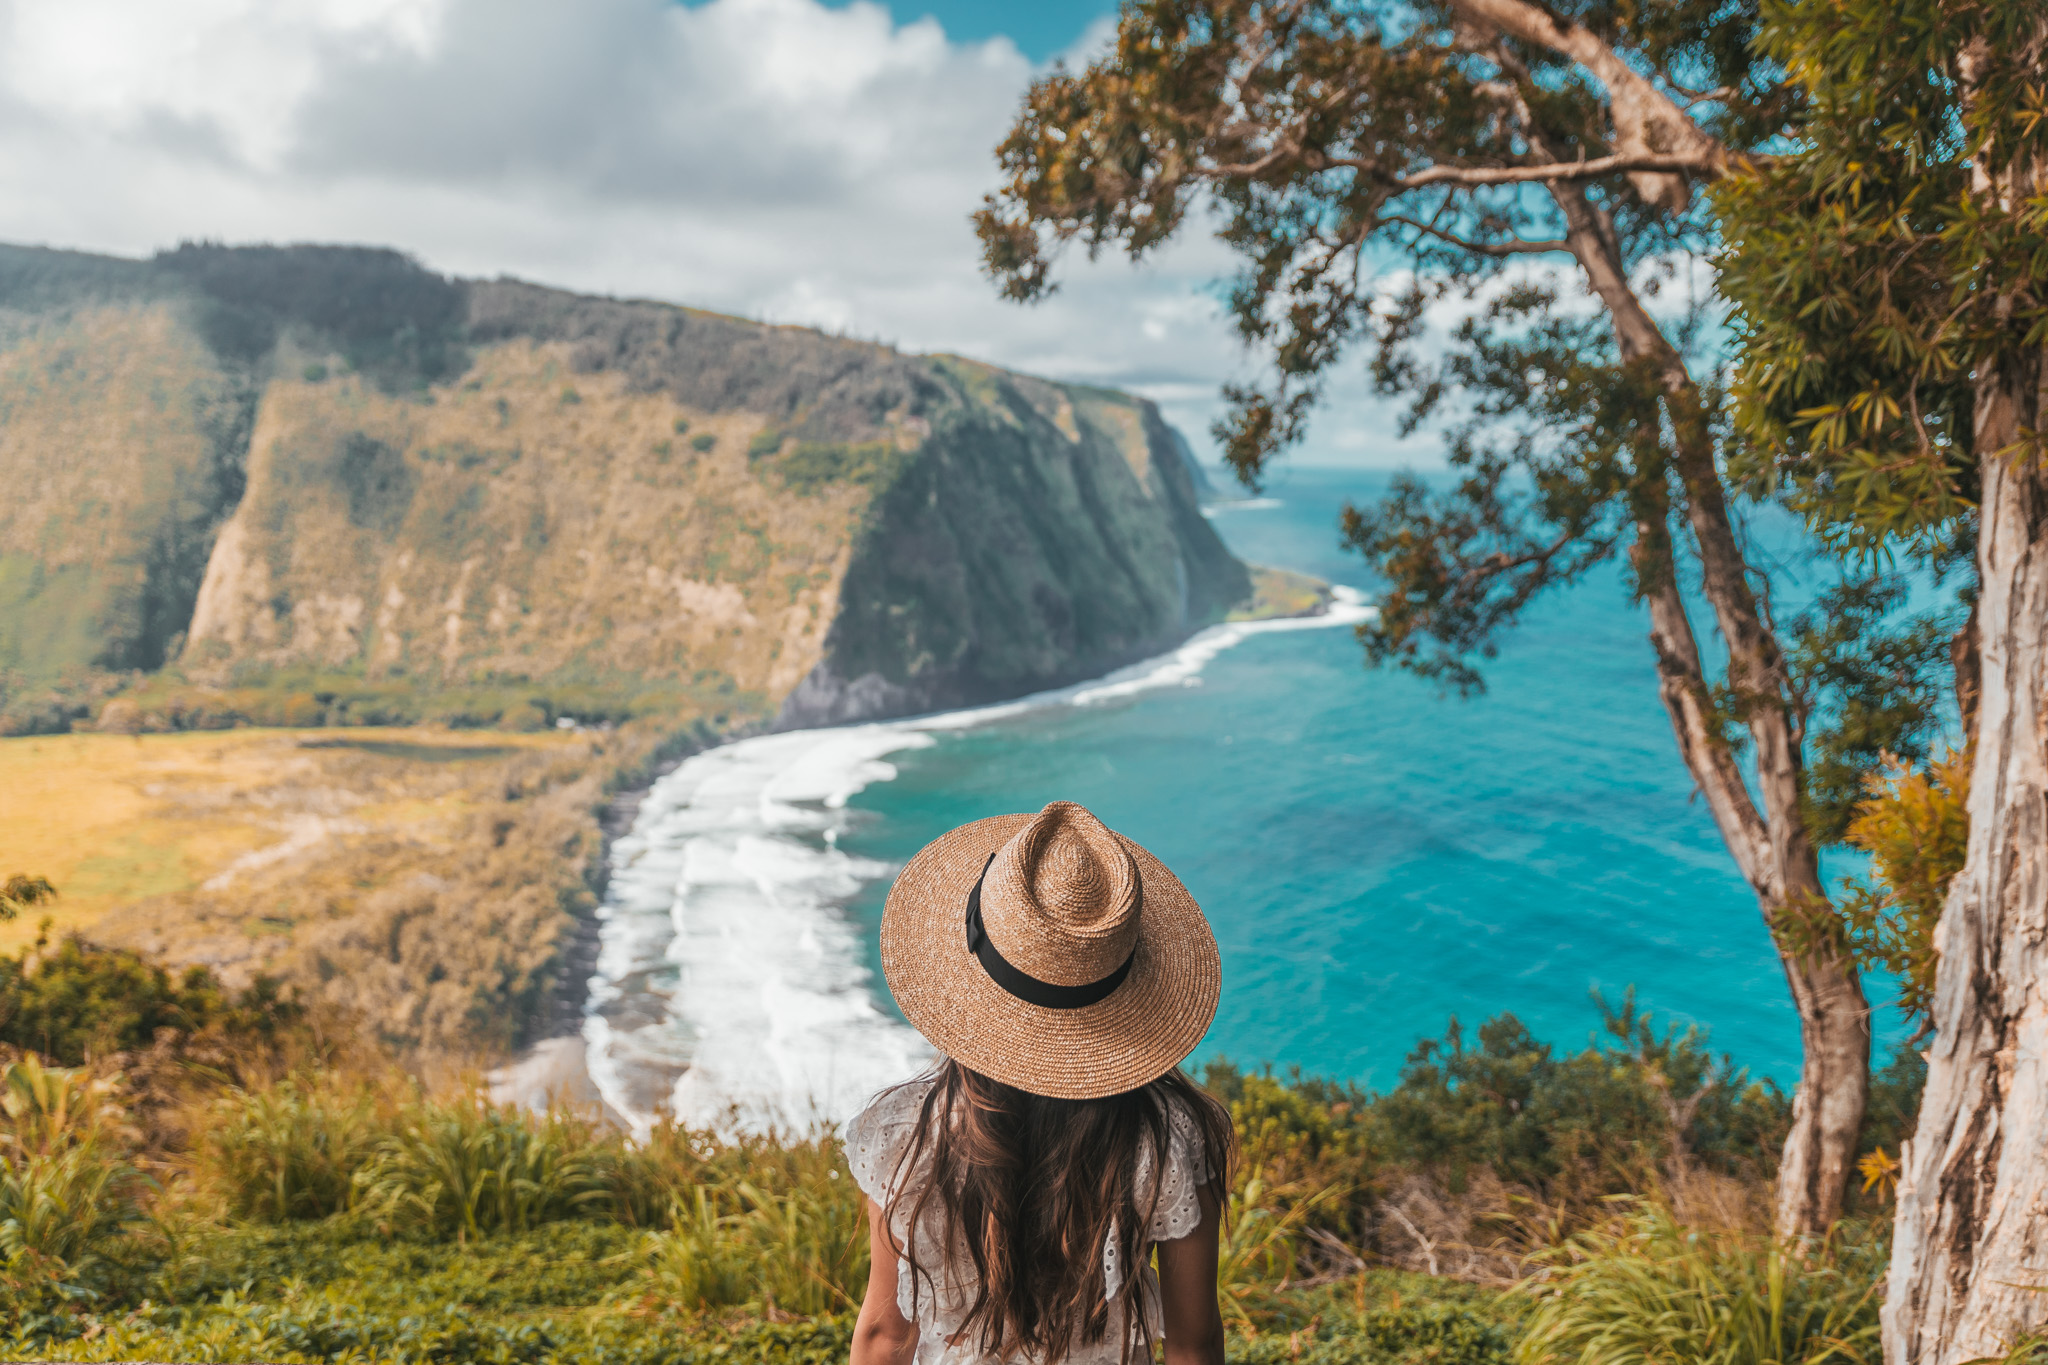 Waipio Valley overlook  // 10 Things You Have to Do on the Big Island of Hawaii // www.readysetjetset.net #readysetjetset #hawaii #bigisland #blogpost #hawaiiguide